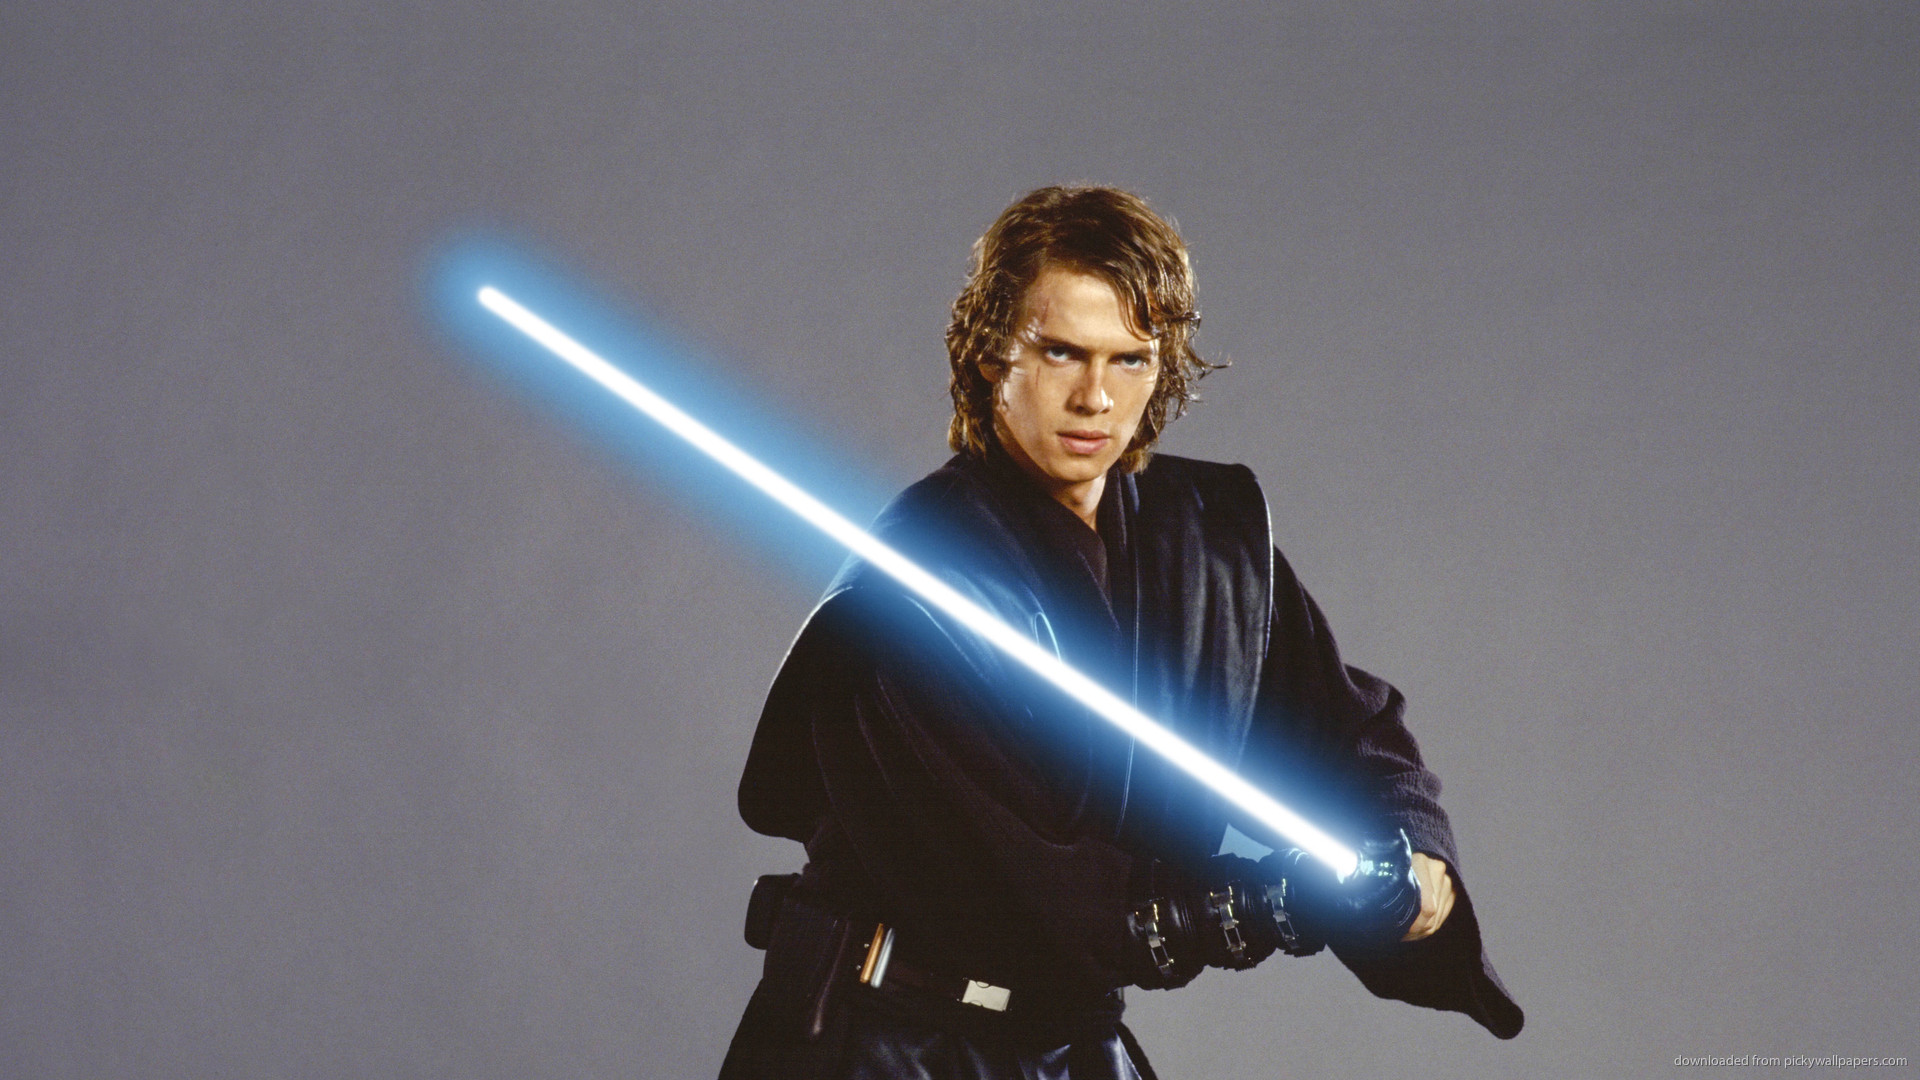 Anakin Skywalker wallpaper 165537 1920x1080